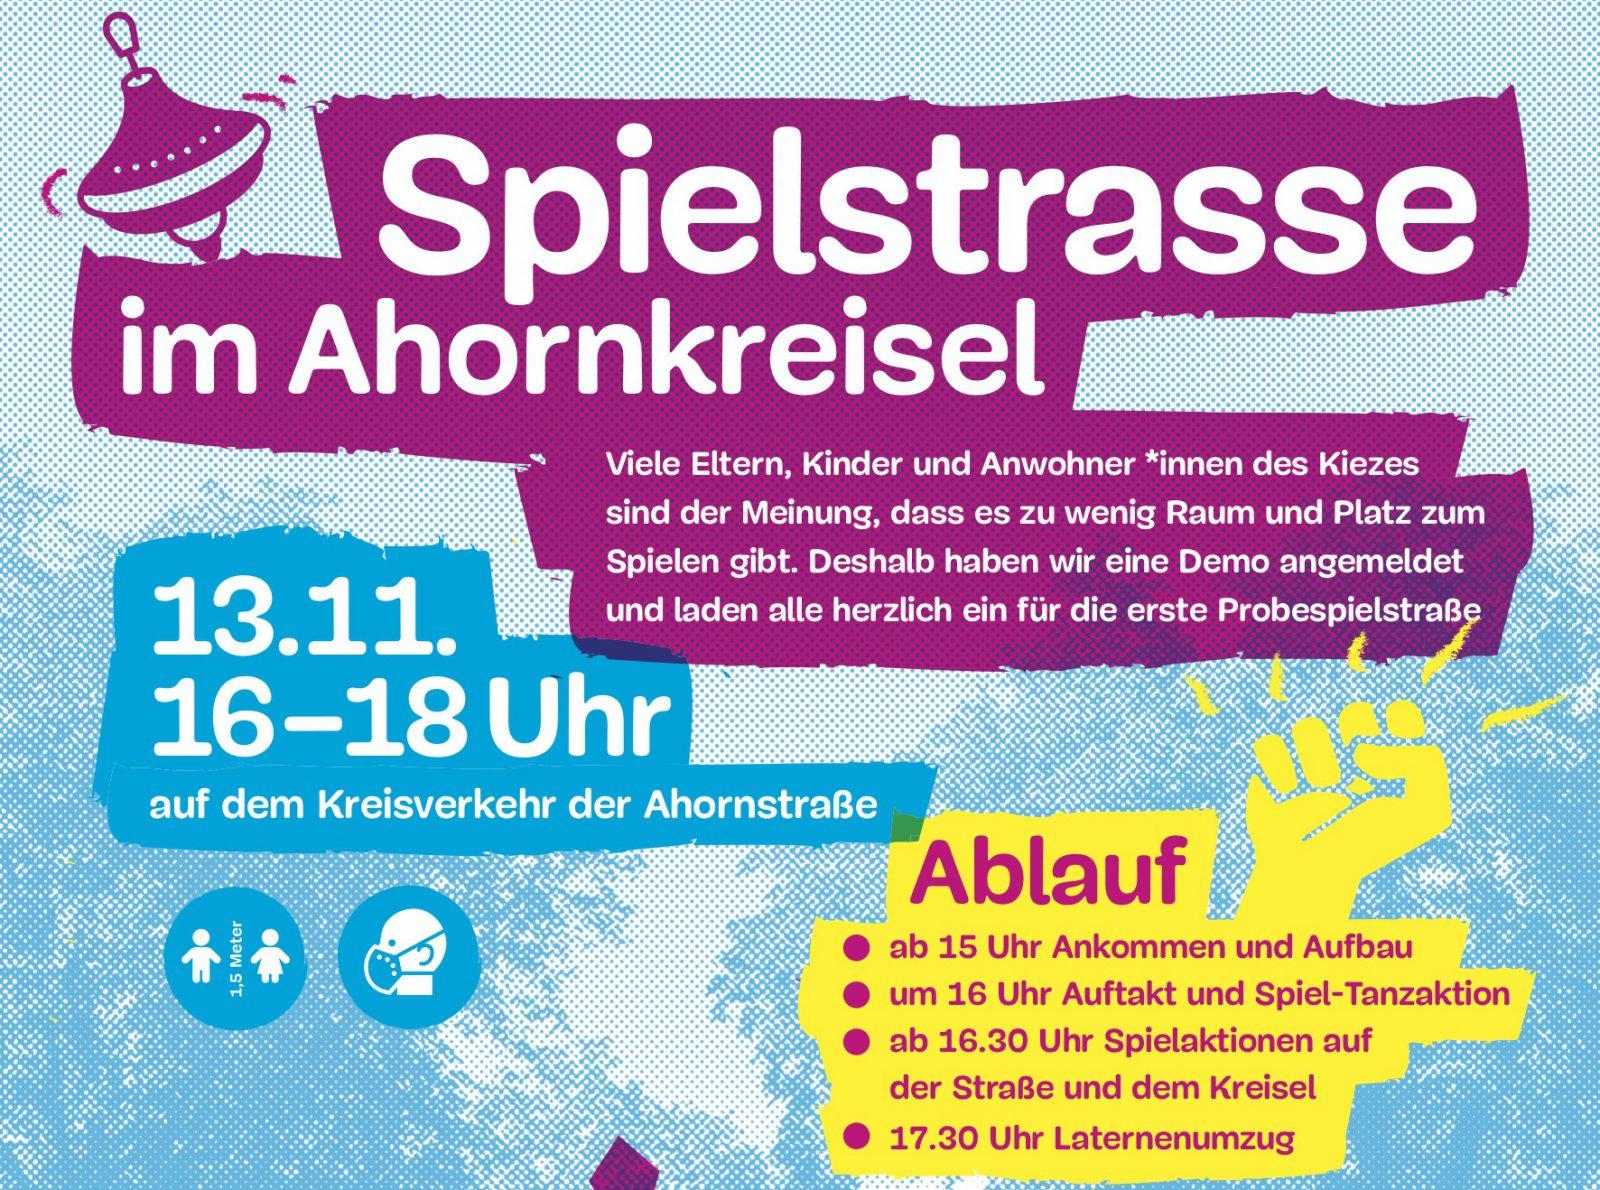 Spielstraße_Ahornkreisel_Karte